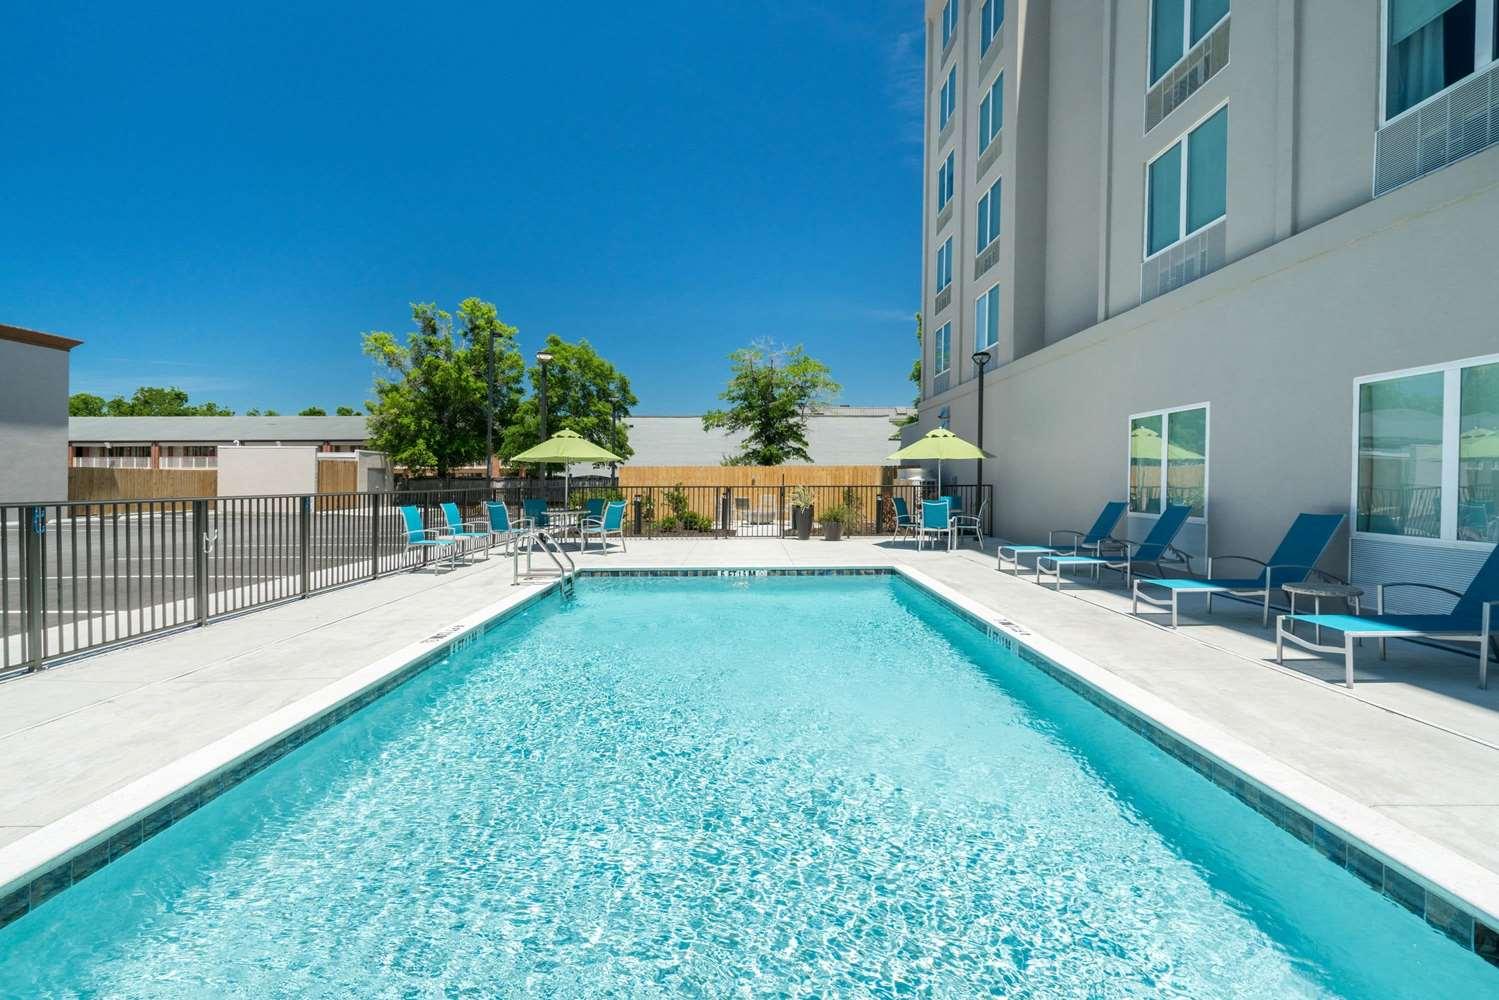 Pool - La Quinta Inn & Suites I-65 Mobile